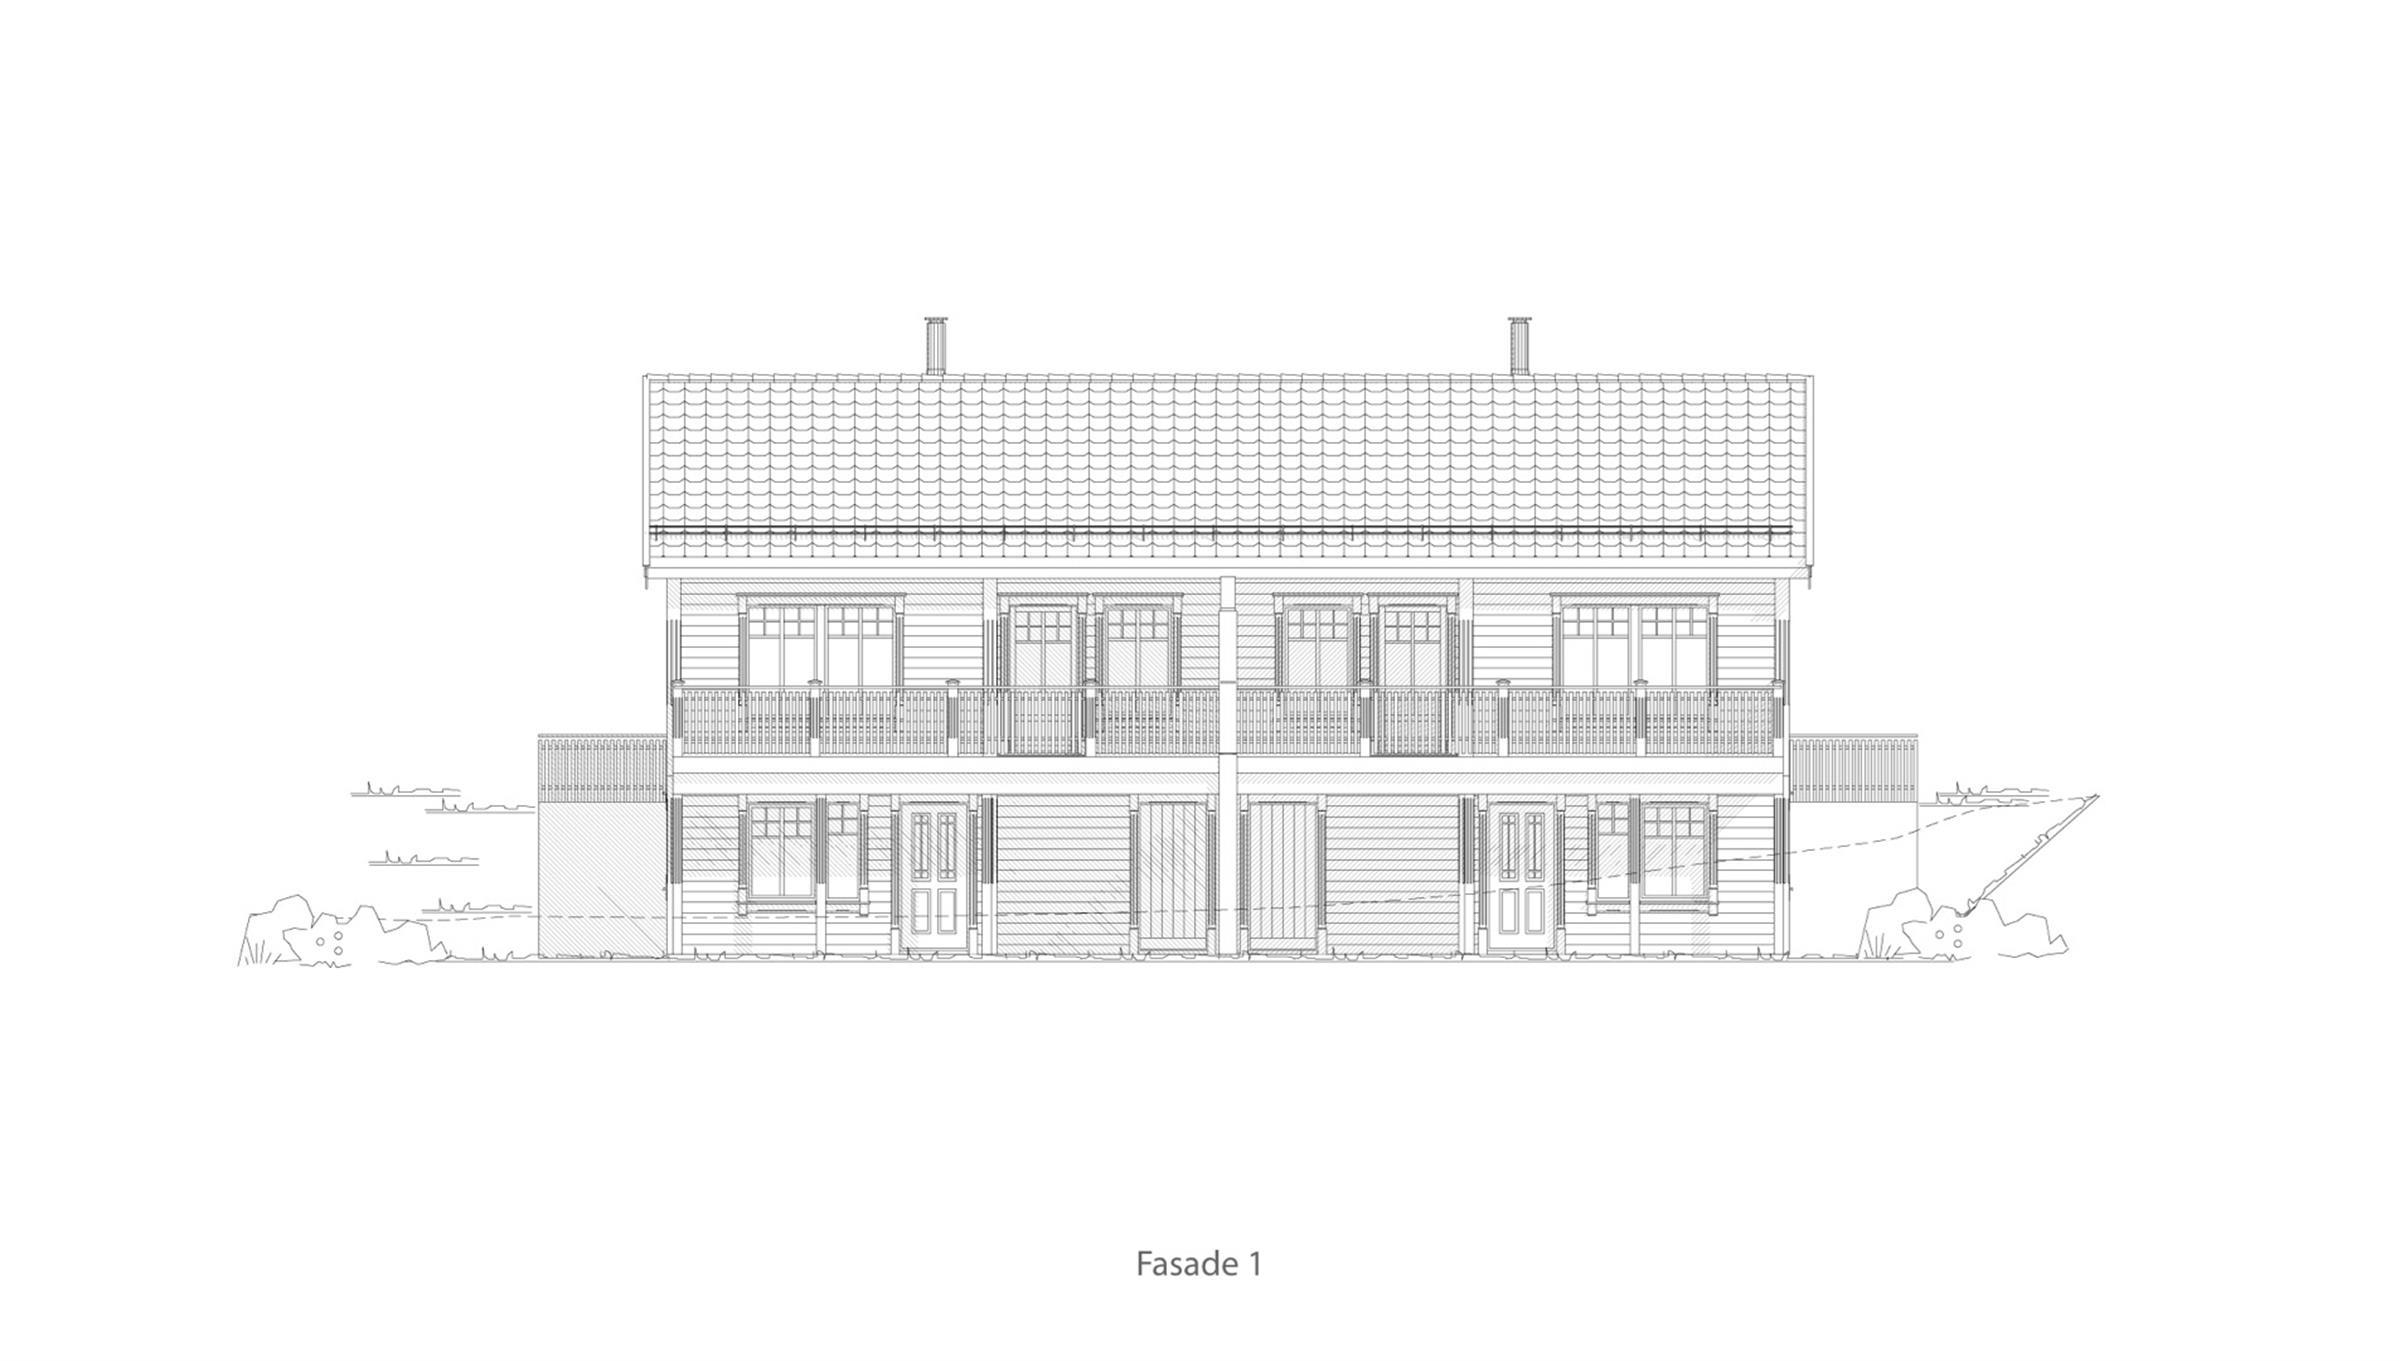 Alta fasade 1